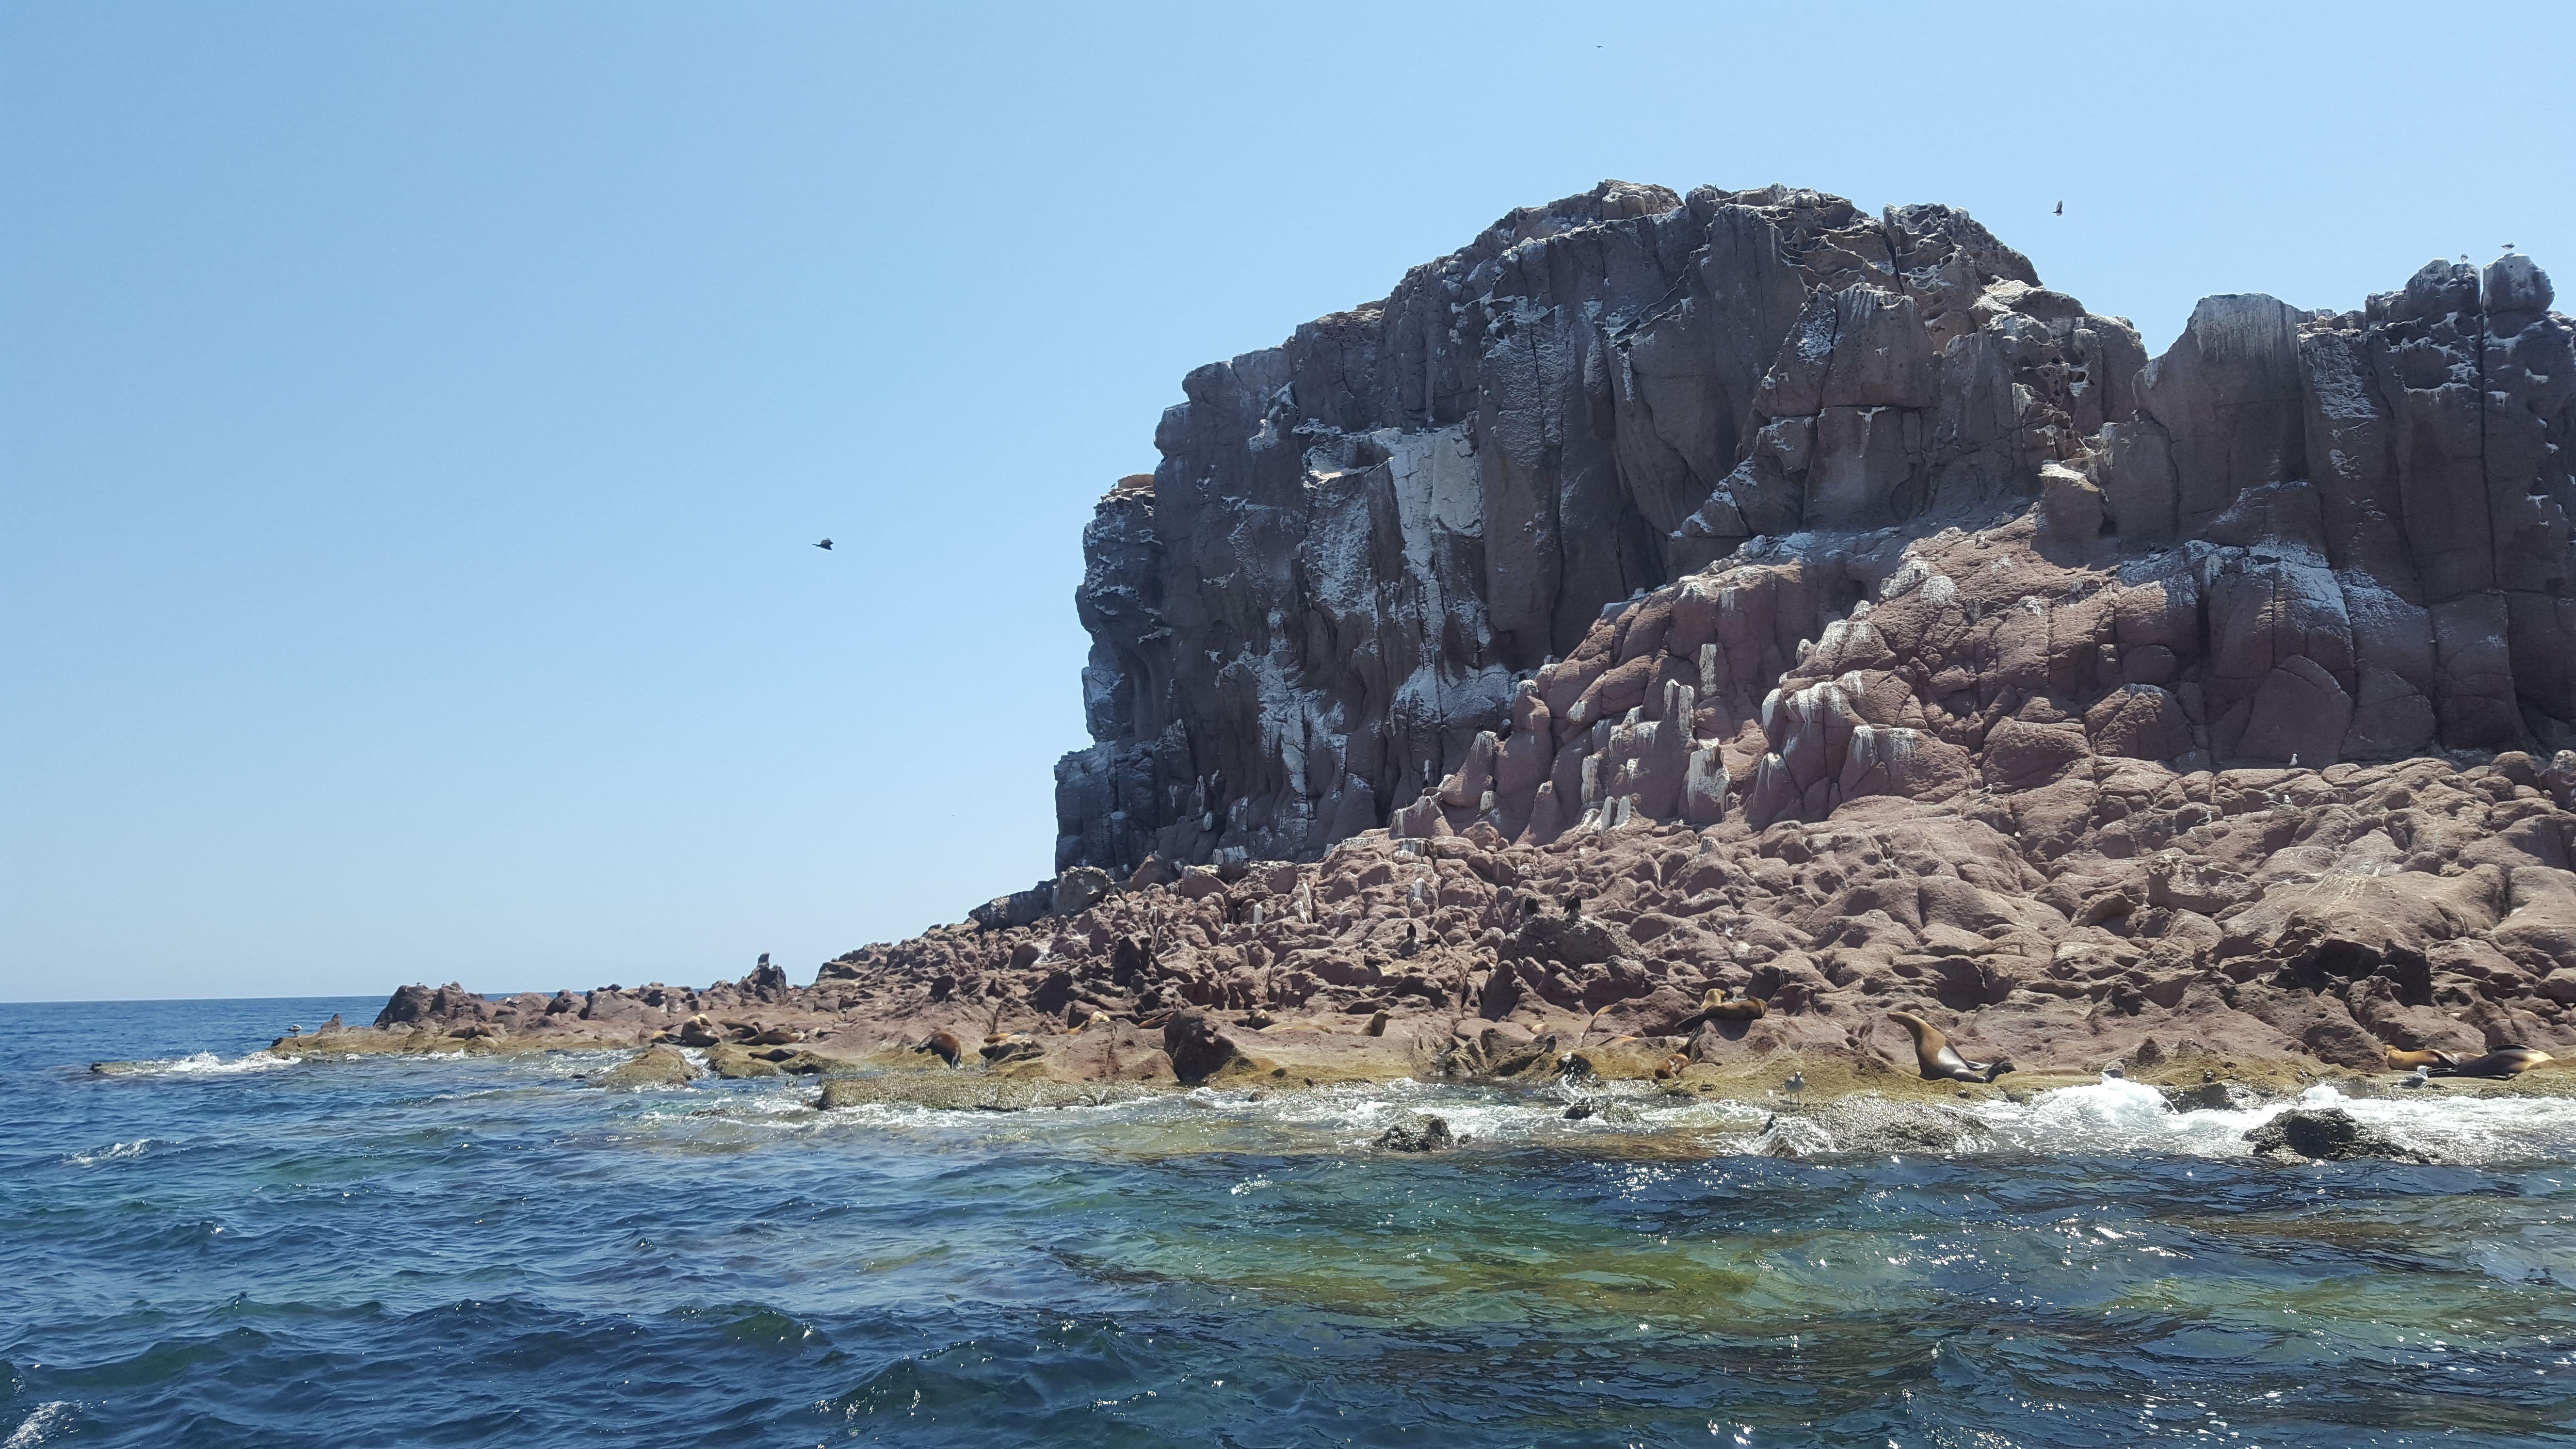 isla-islotes-1.jpg